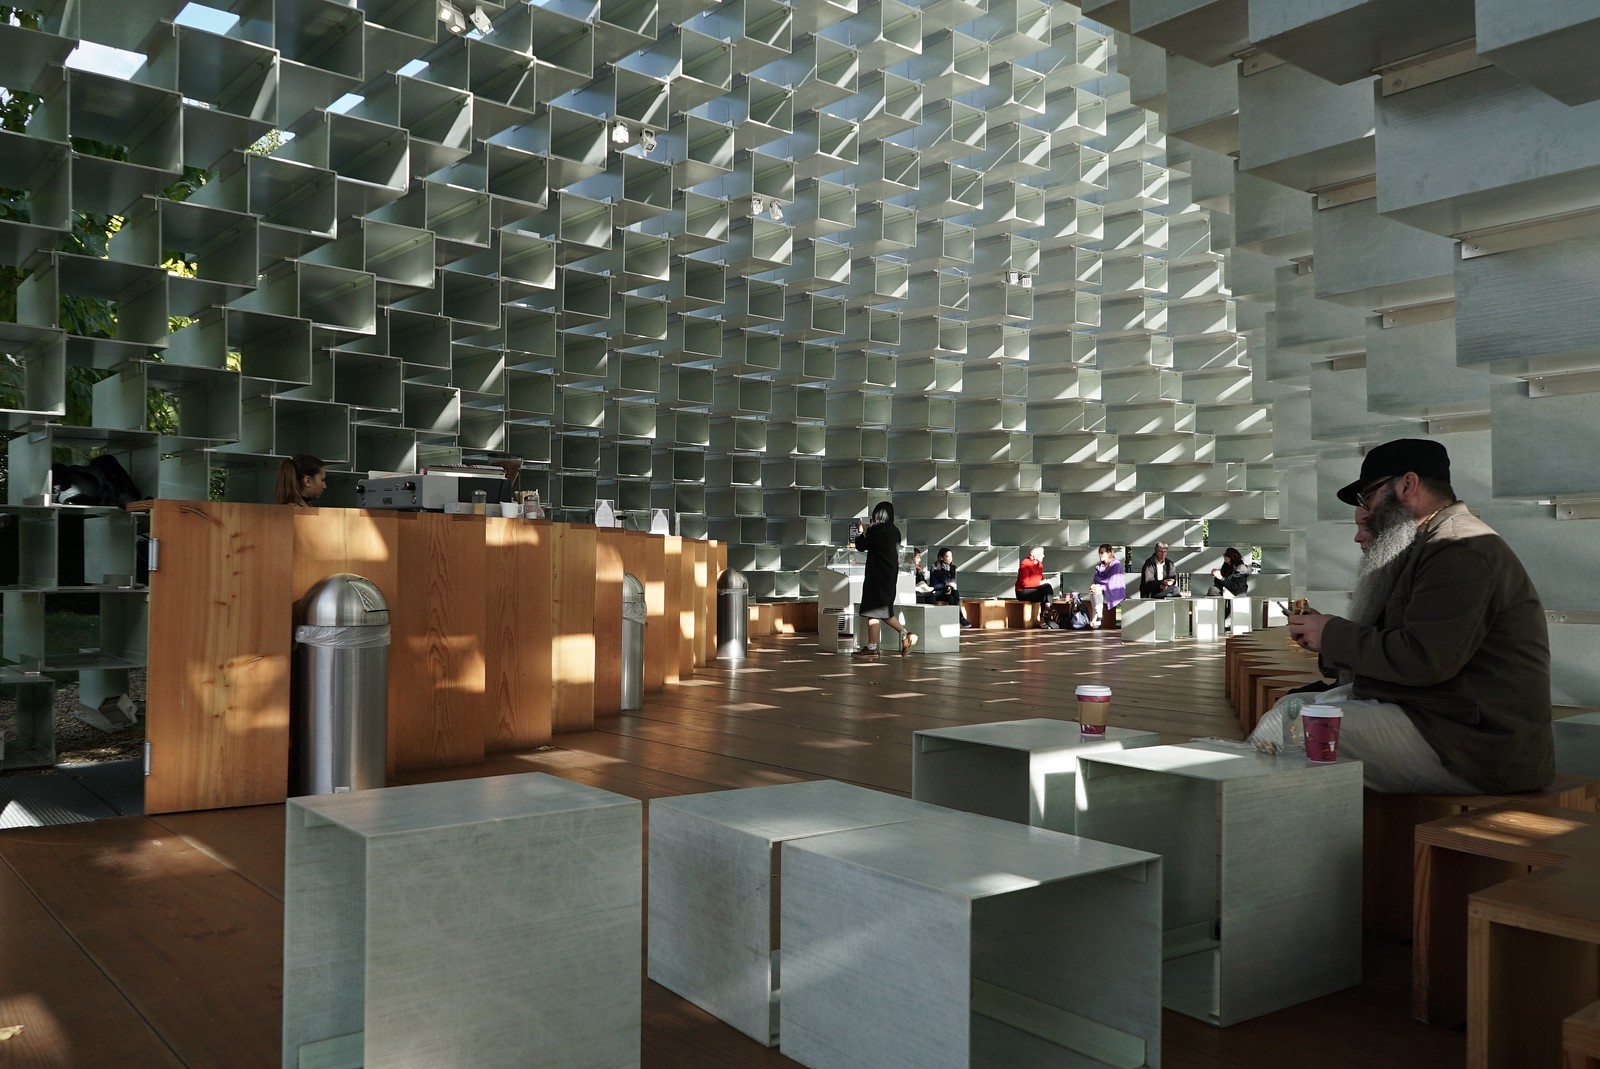 Serpentine Pavilion 2016 by Bjarke Ingels Group (BIG)